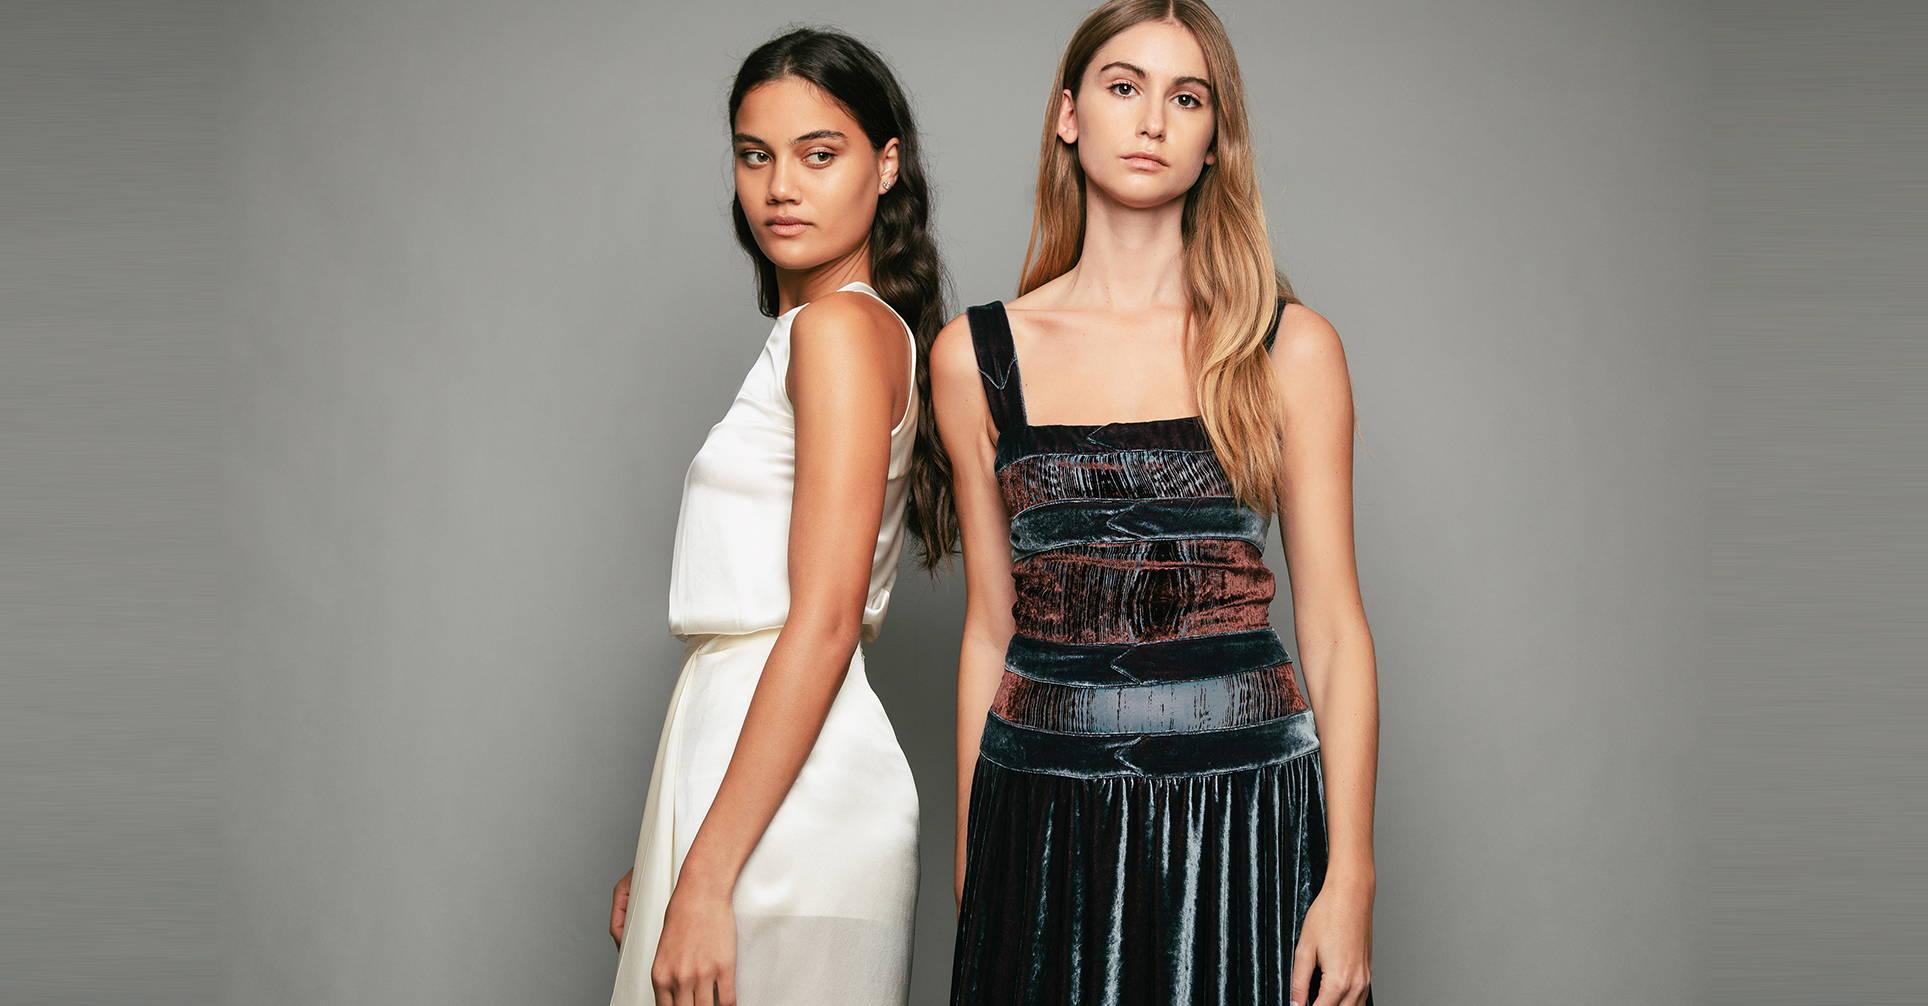 PENDA • Luxury Designer Fashion  • Frida Kahlo velvet dress • Festive Satin Top • Campaign • Studio • Collection SS21